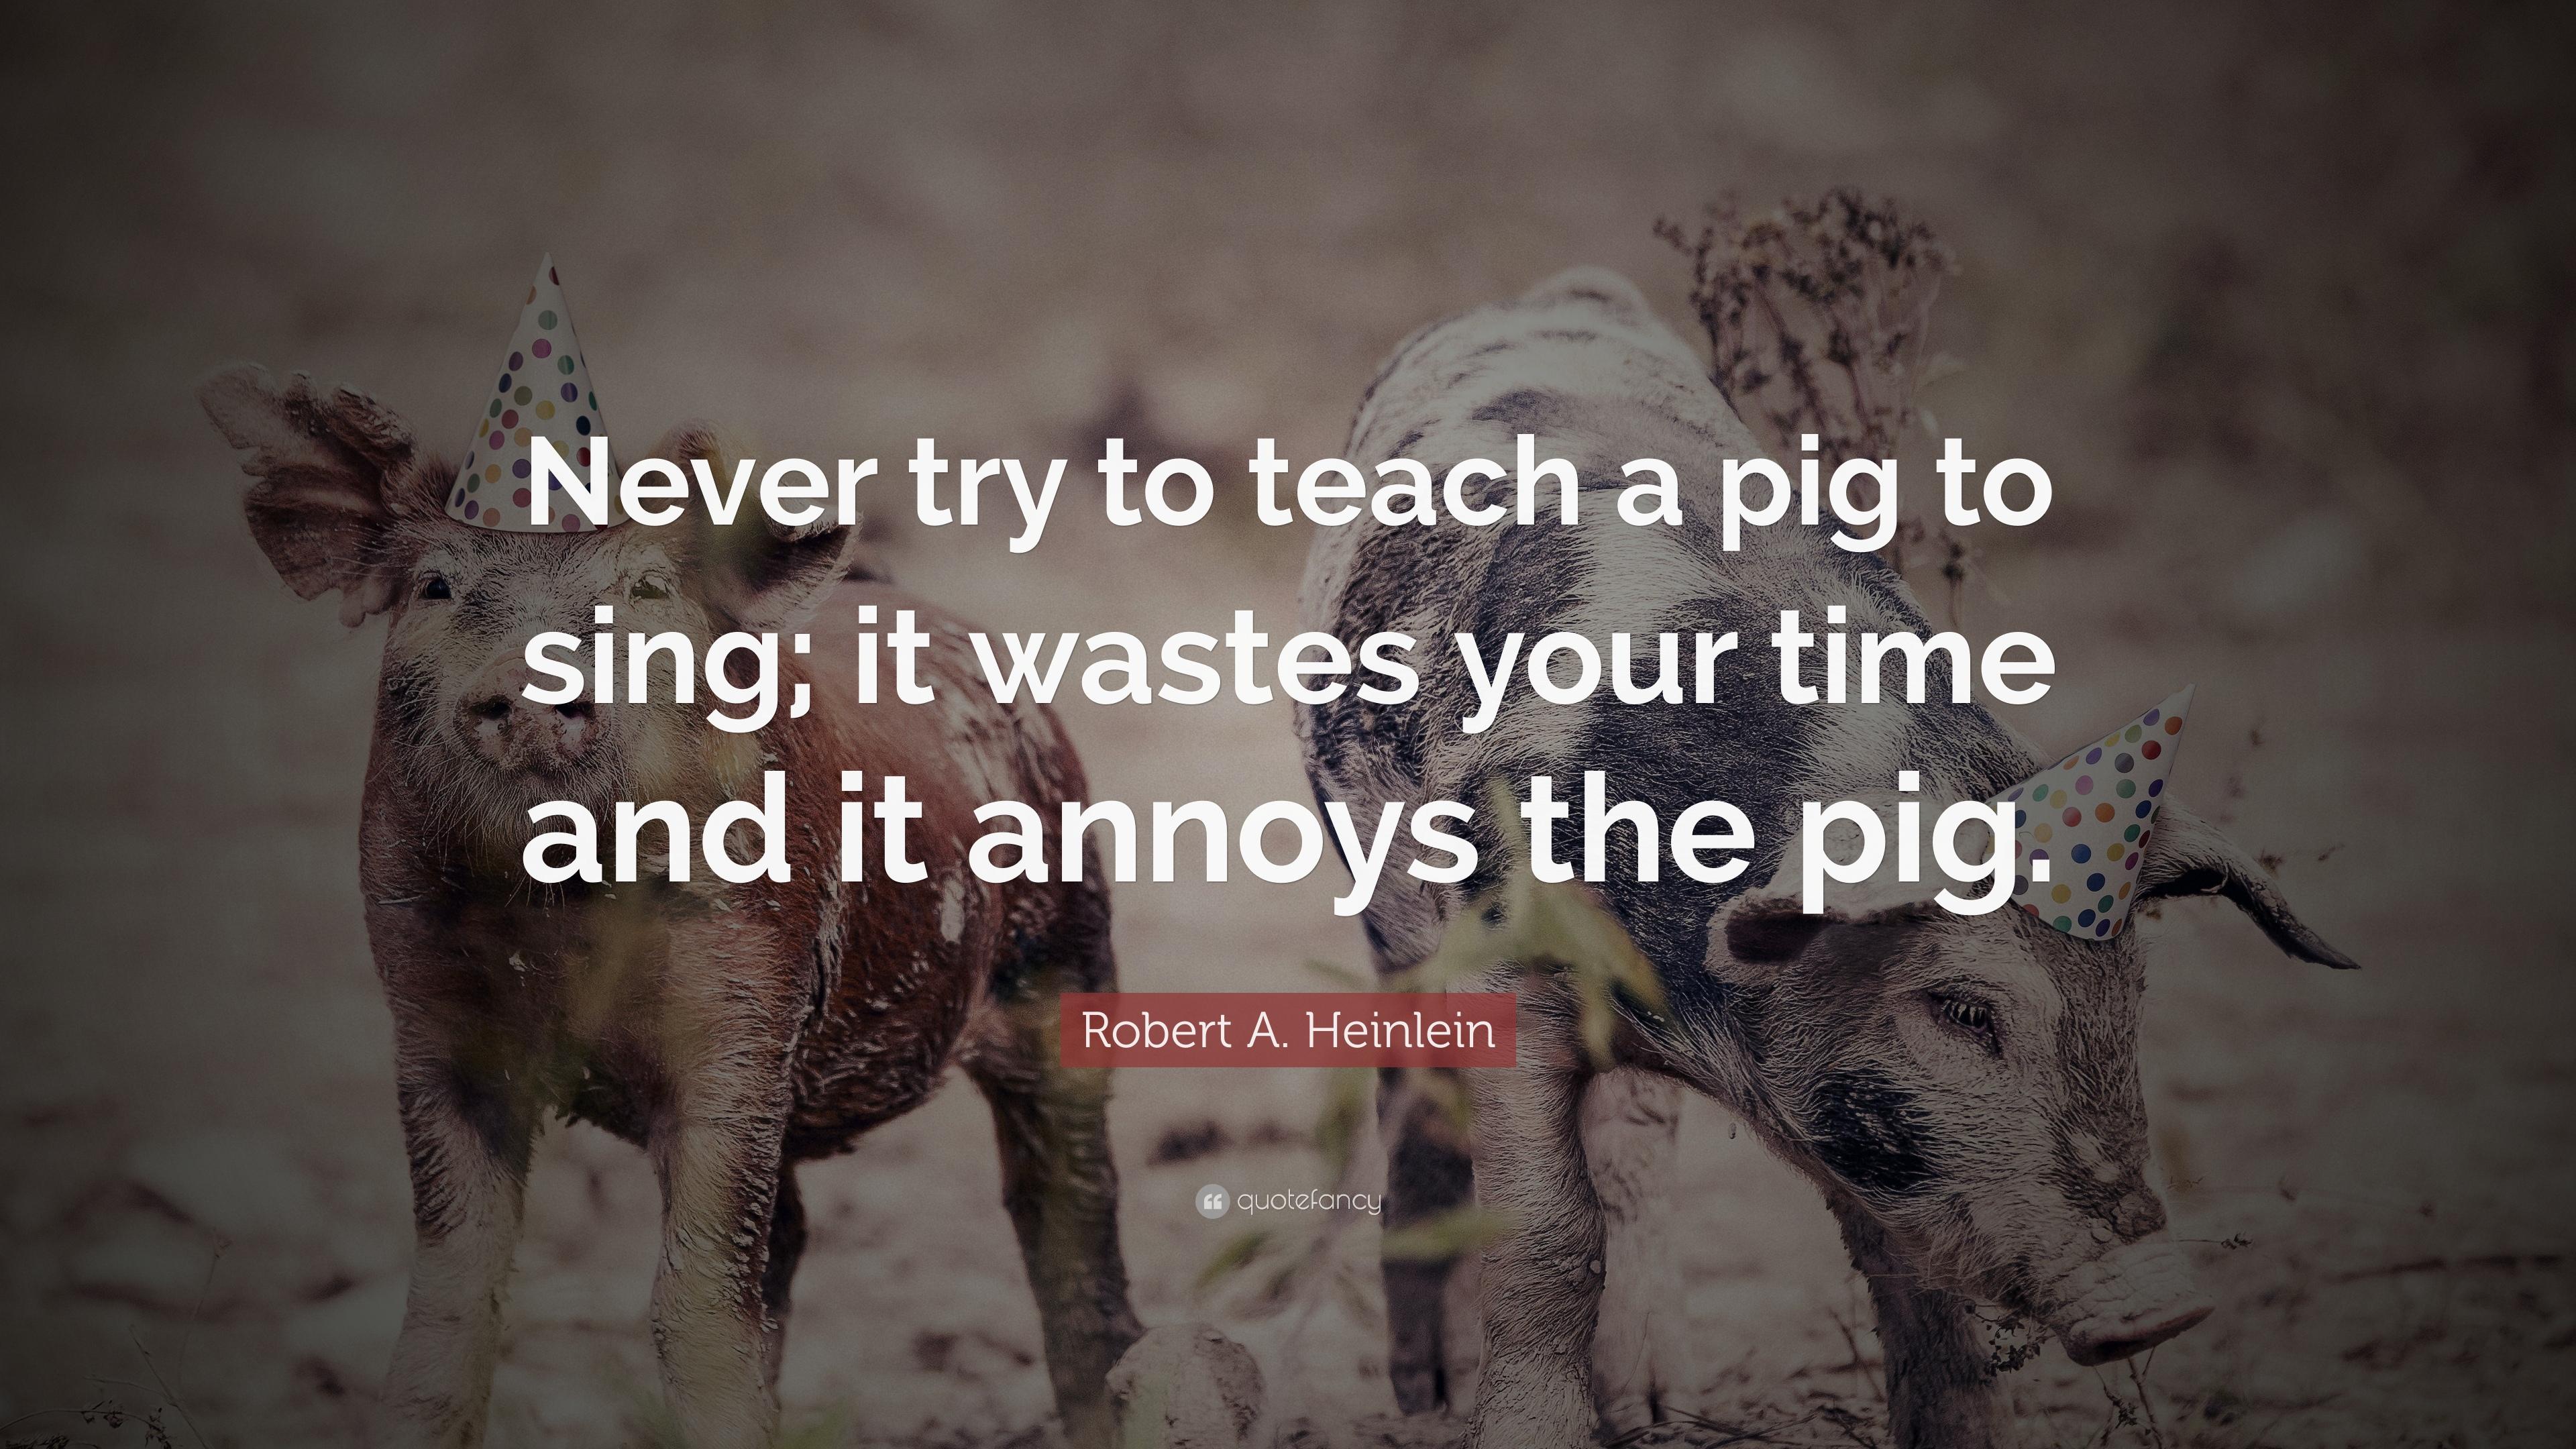 [Image] Great advice